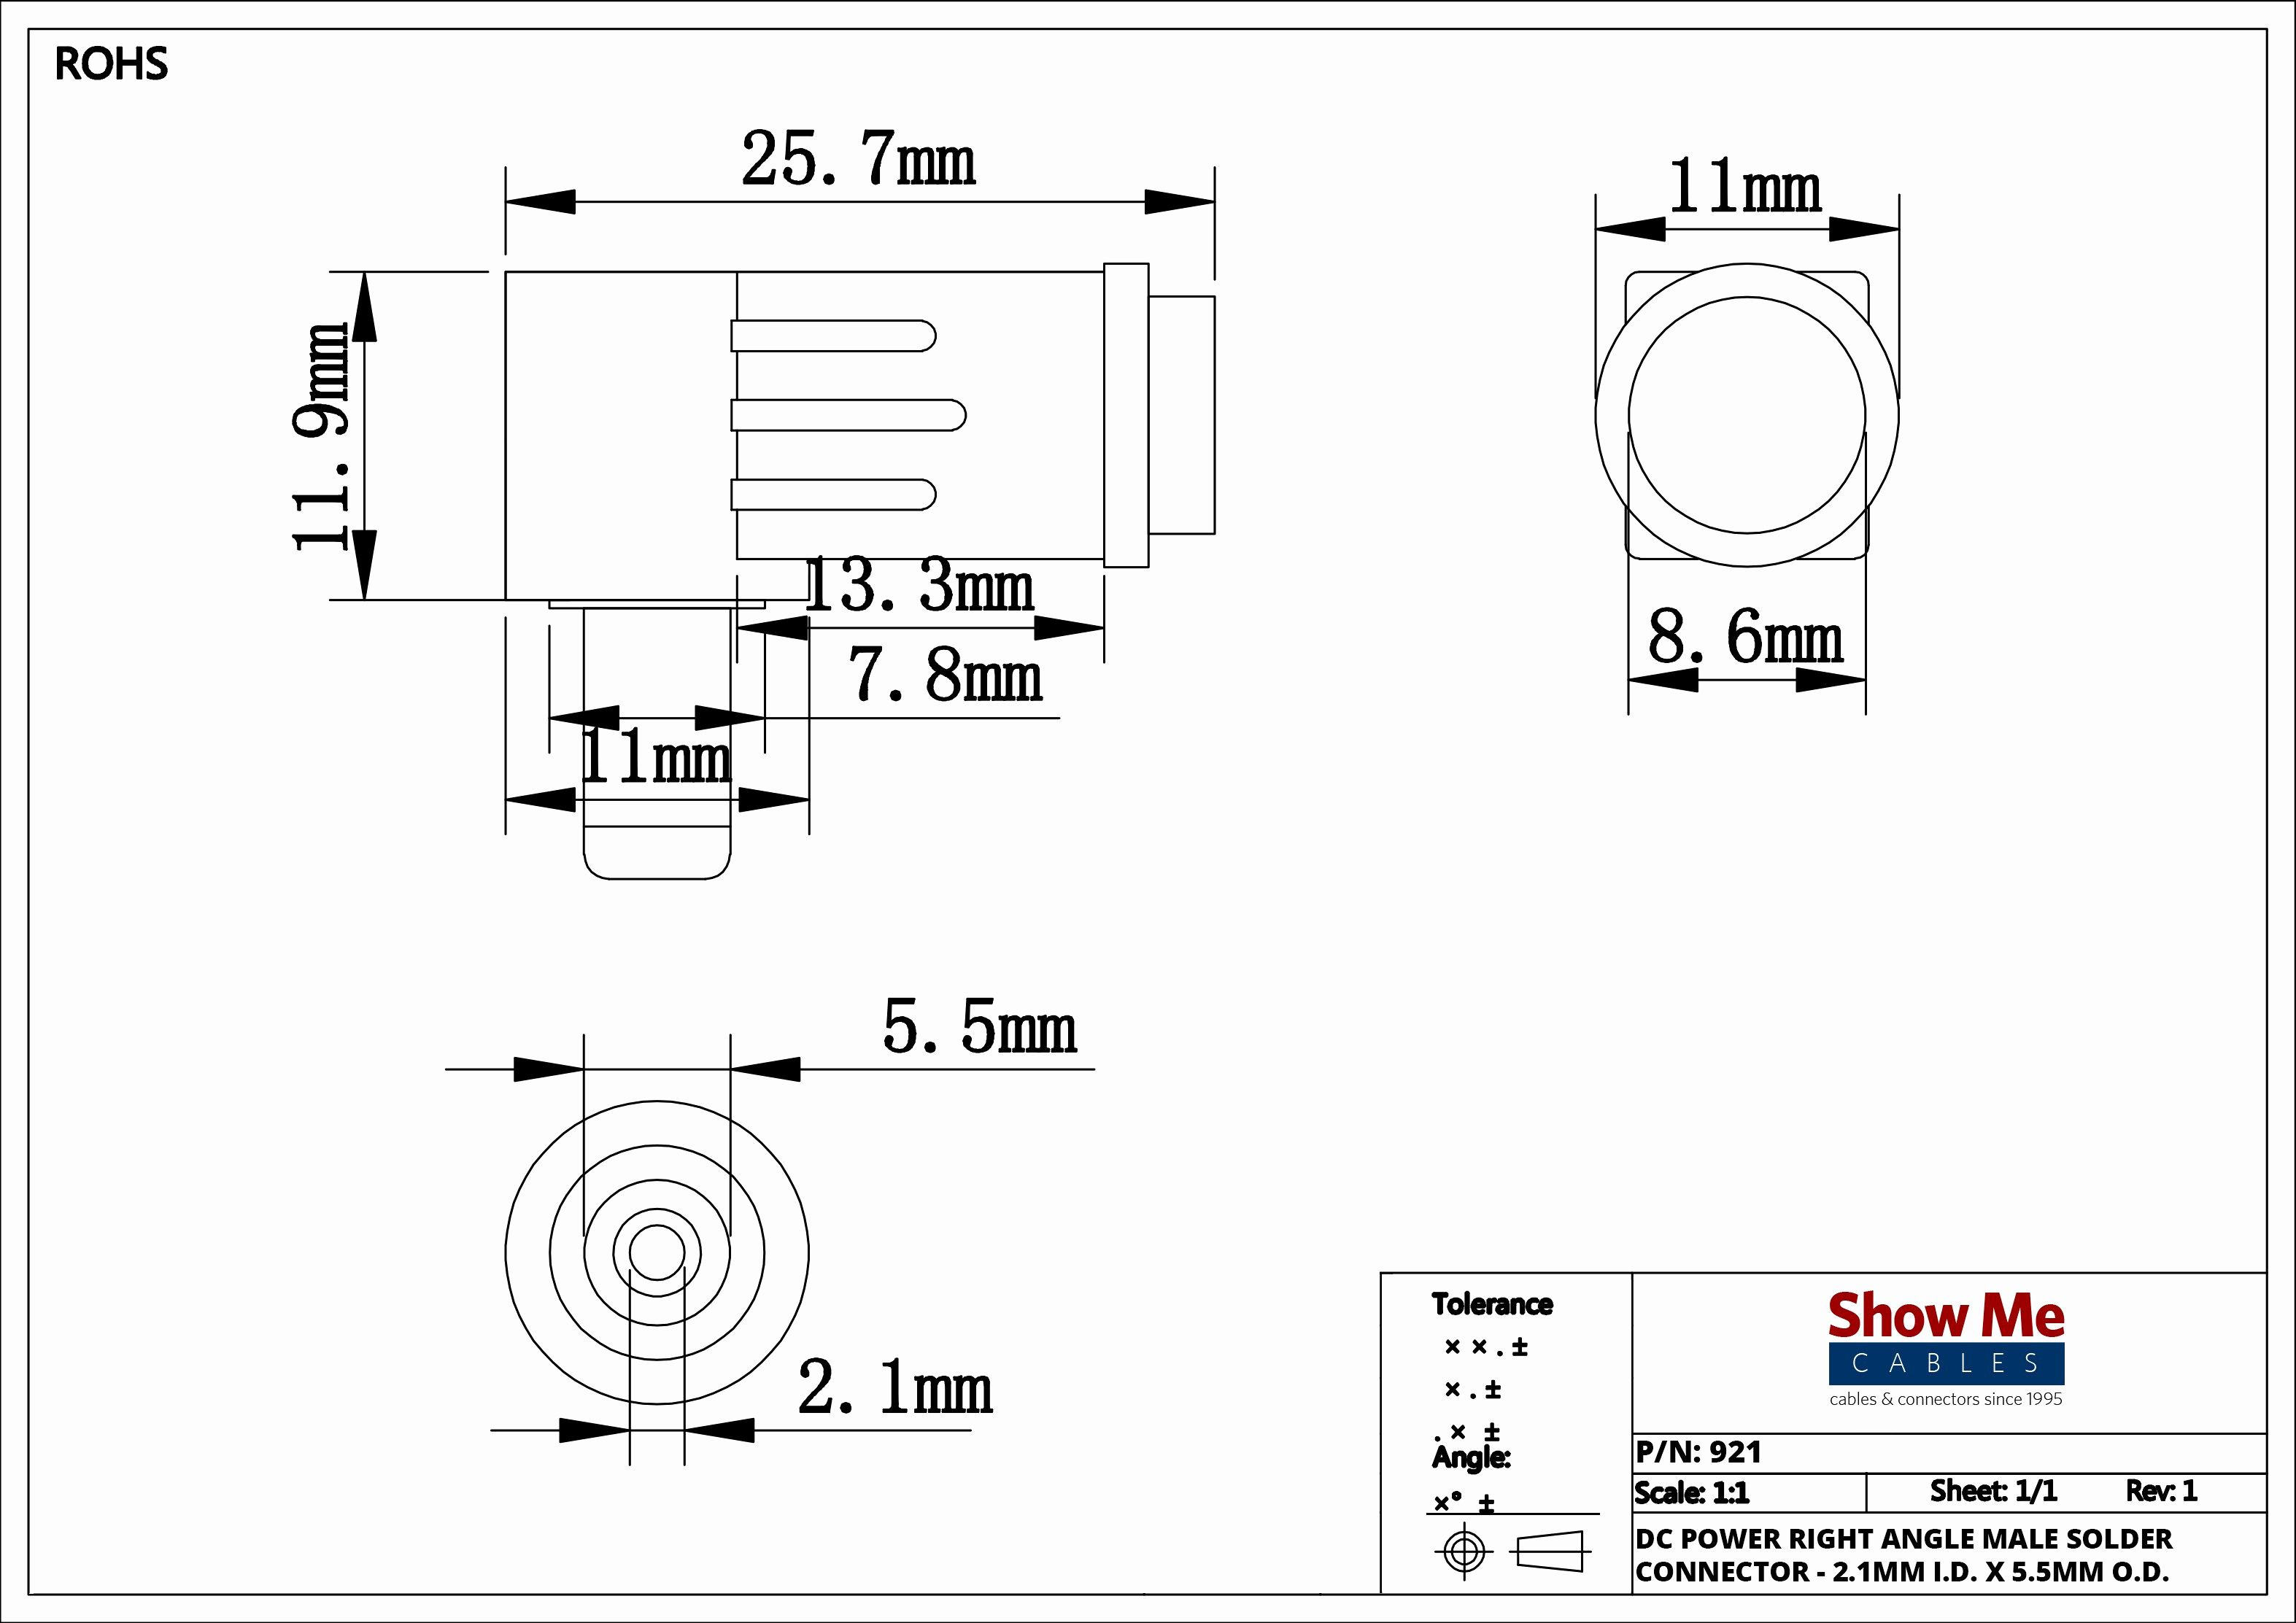 Ethernet Wiring Diagram Printable | Wiring Diagram - Cat 5E Wiring Diagram